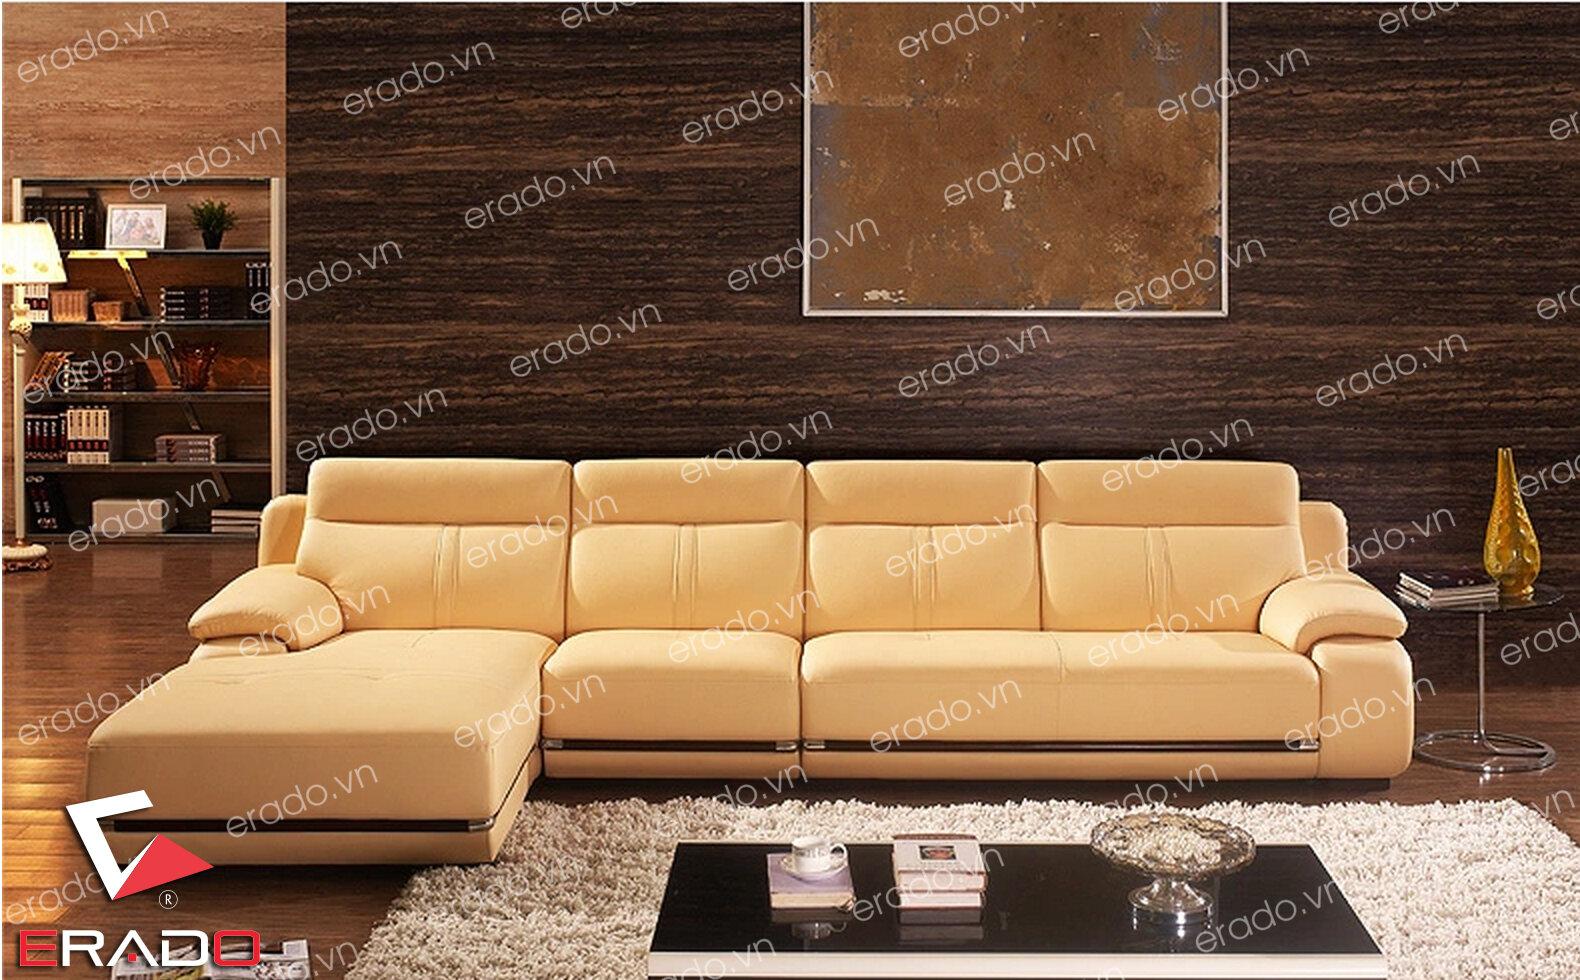 Sofa da mã 413